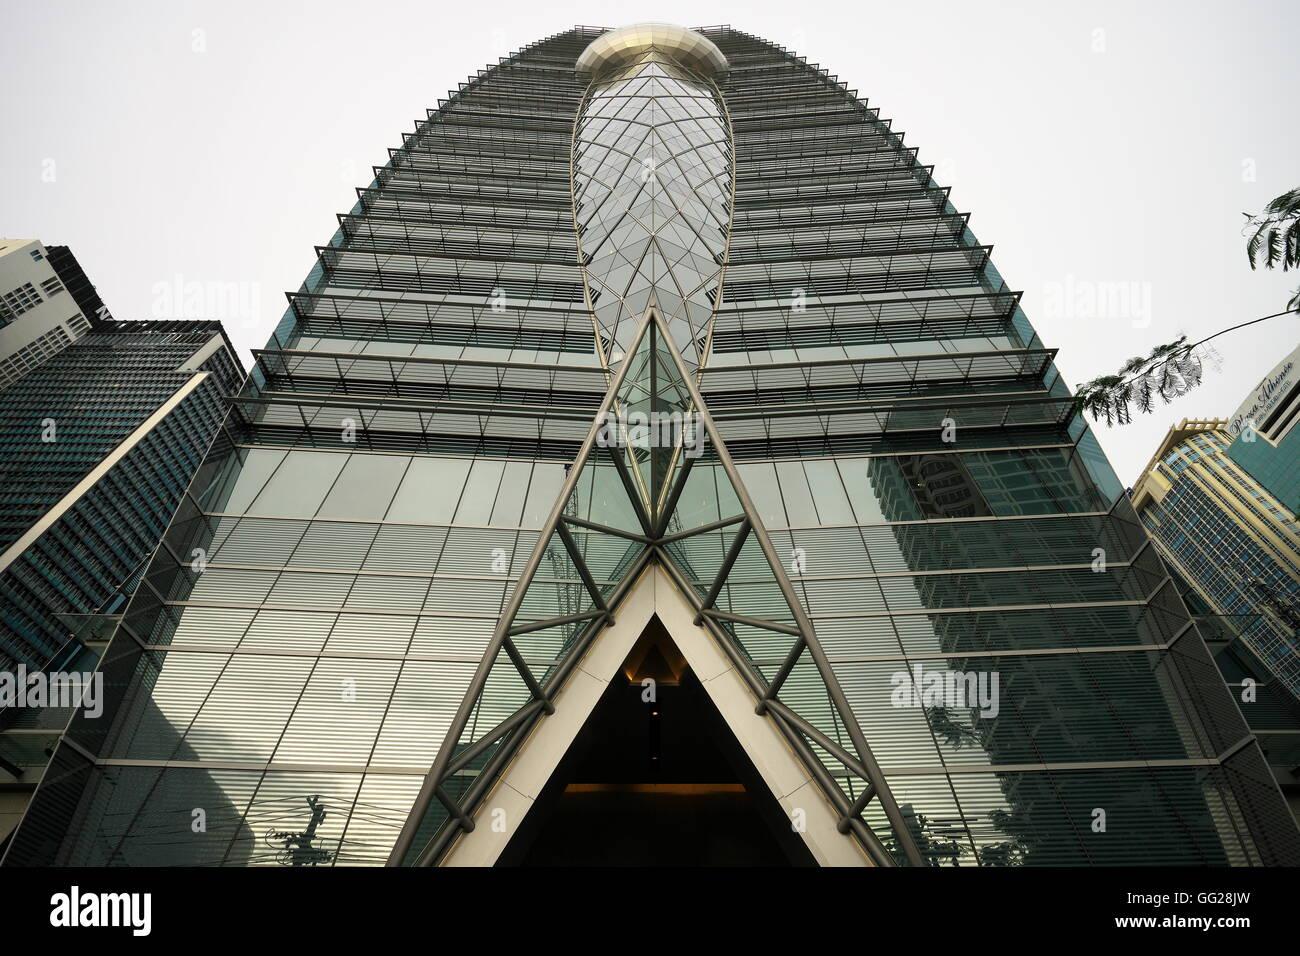 Park Ventures Ecoplex Building, Okura Prestige Hotel,Bangkok - Stock Image